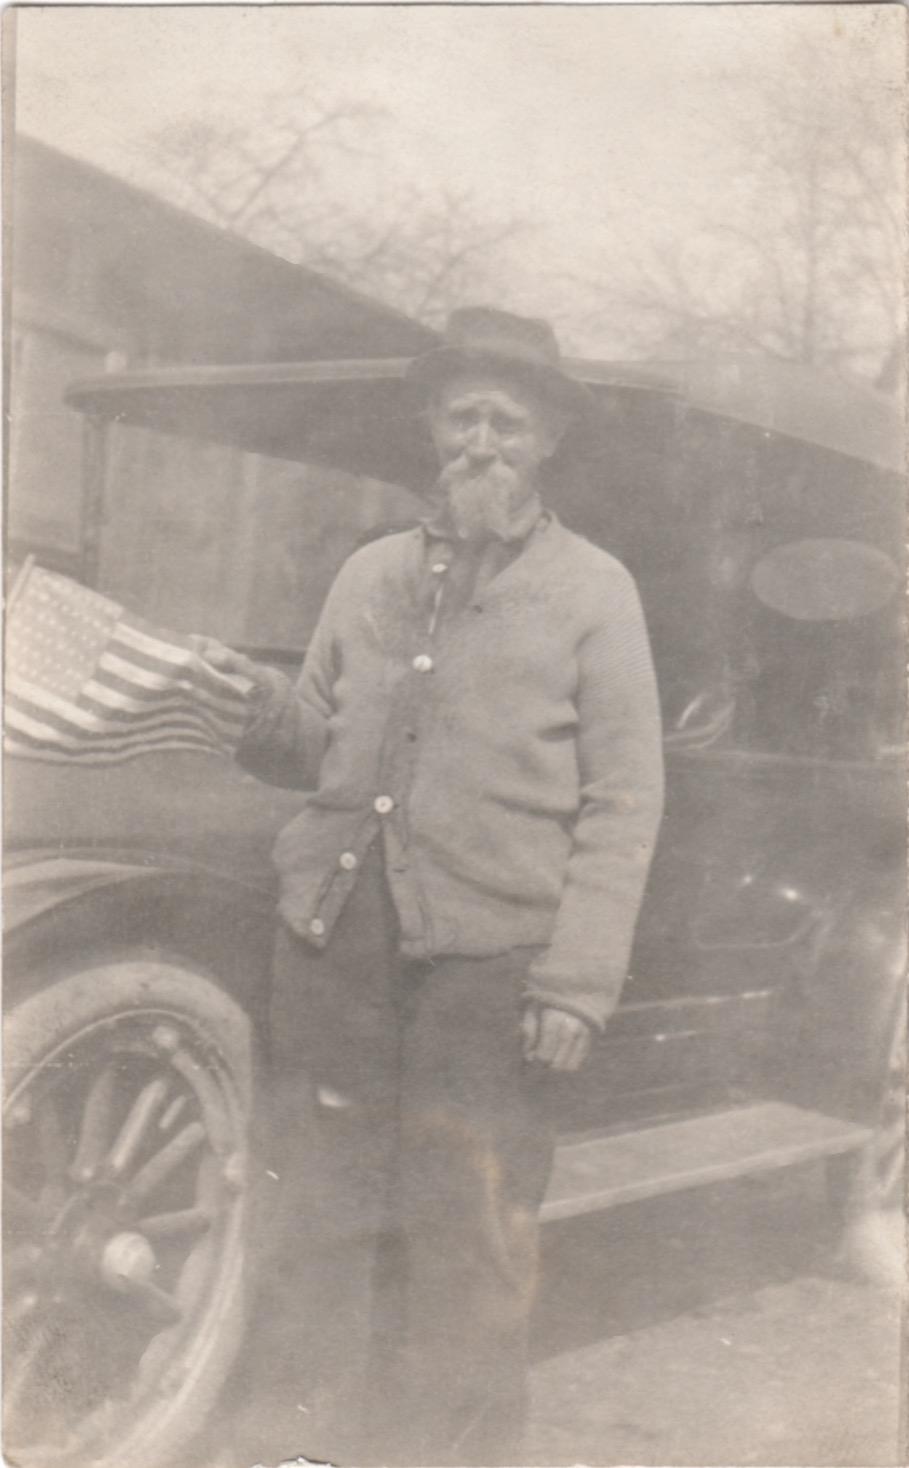 Rhinard Rhoads (1833-1920)